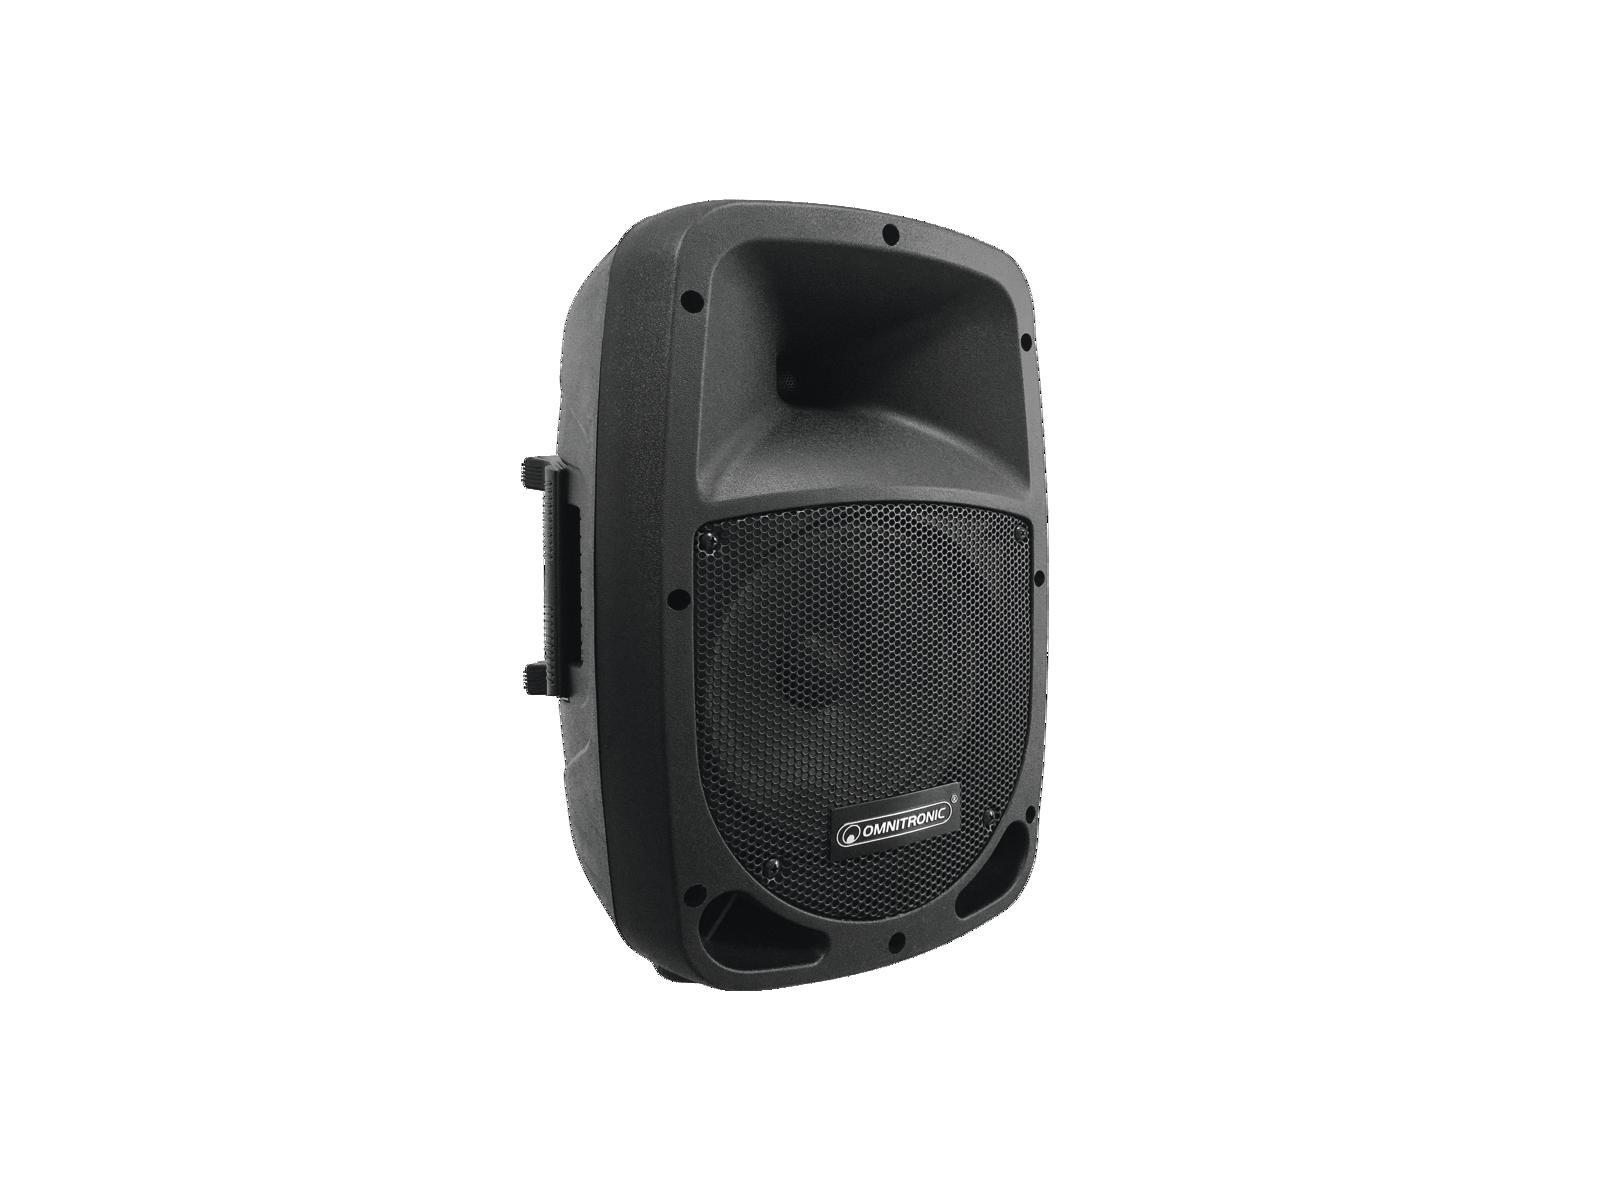 OMNITRONIC VFM-208A 2-Wege Lautsprecher, aktiv